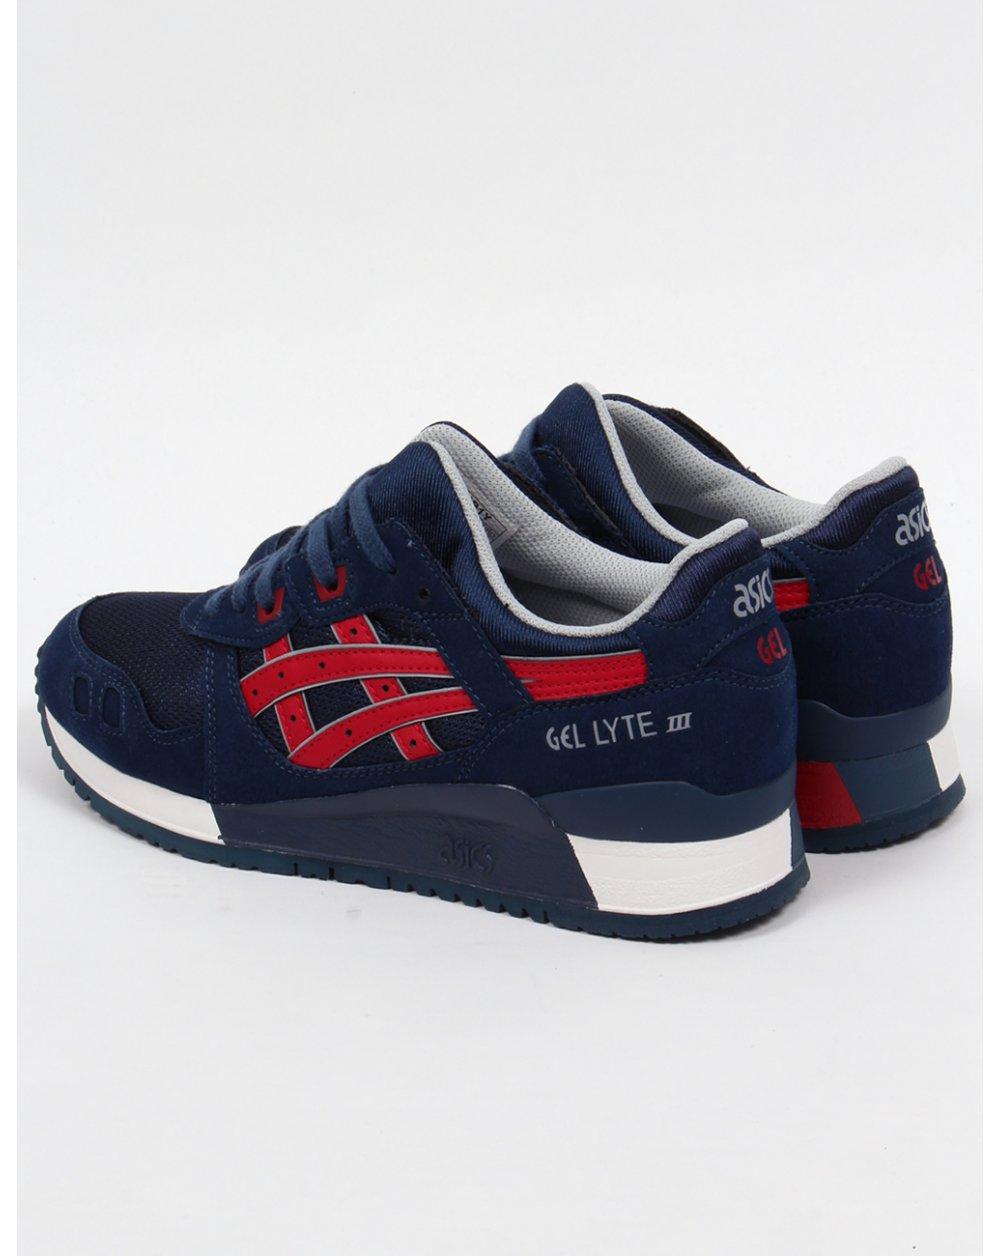 Asics Gel Lyte Iii Zapatos Tinta China Azul Marino Rojo Tango 183Ge